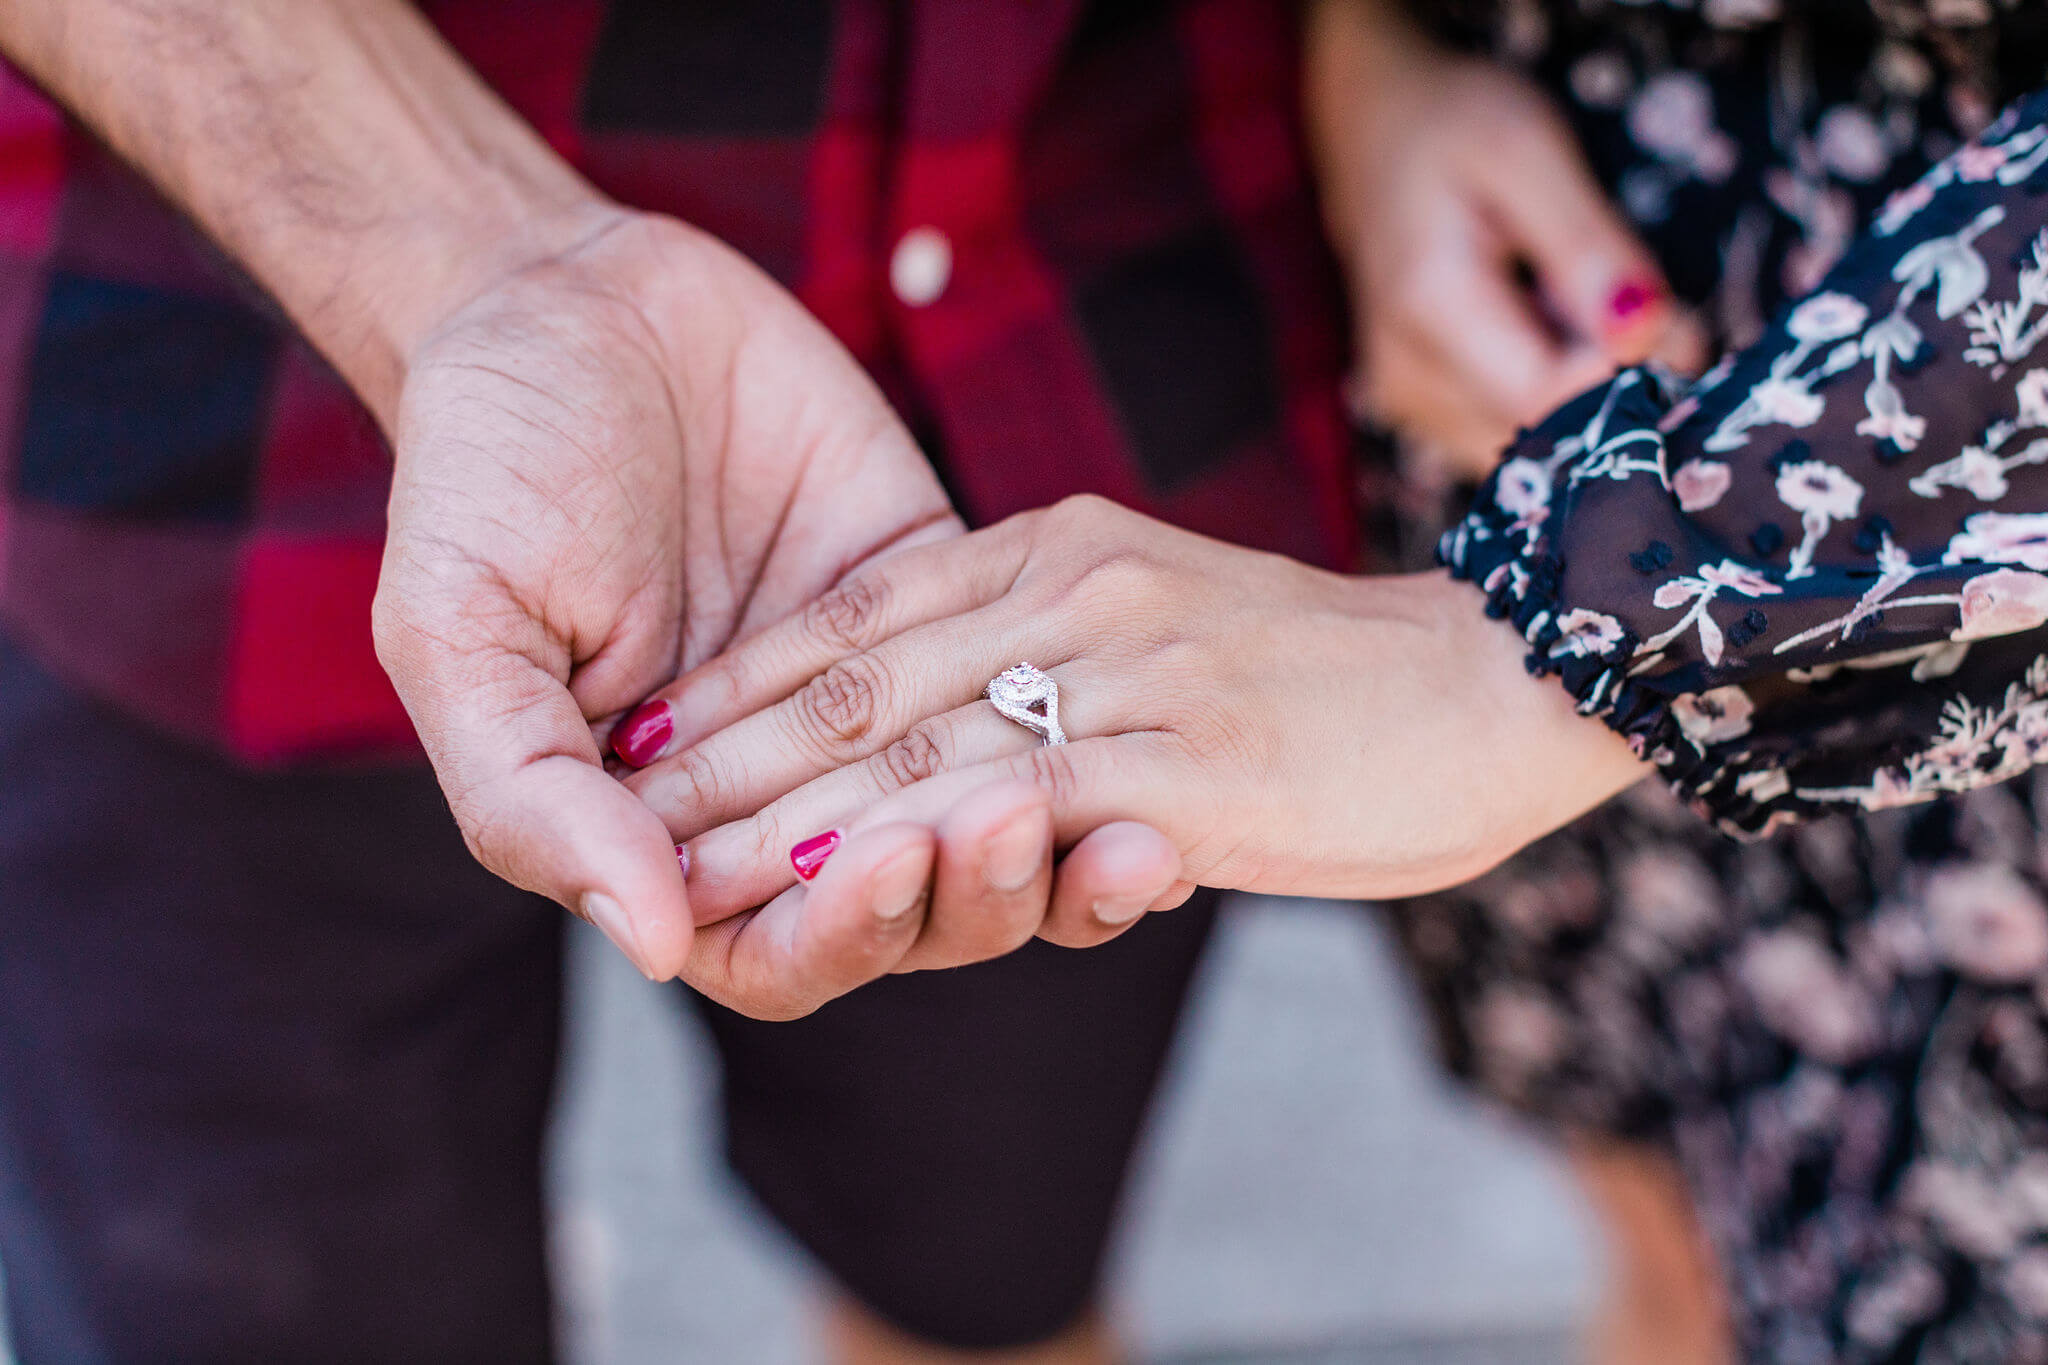 Apt-b-photography-savannah-proposal-photographer-savannah-wedding-forsyth-park-proposal-18.jpg